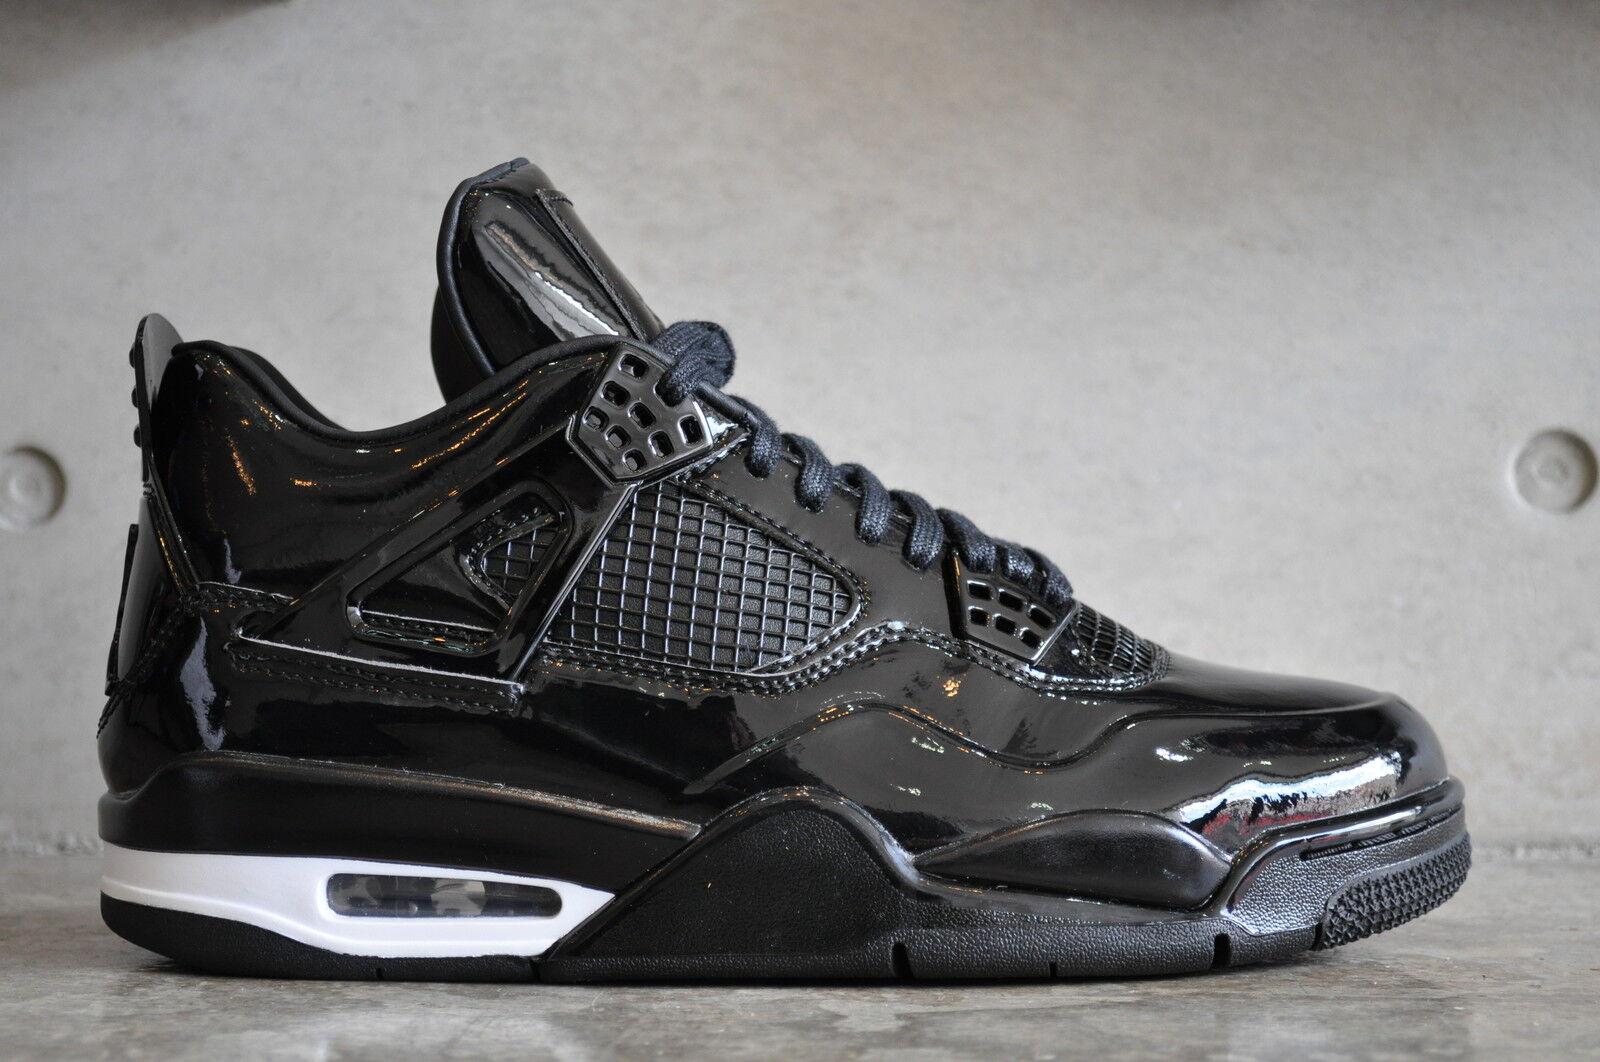 Nike Air Jordan 11LAB4 Black 2015 - Black White